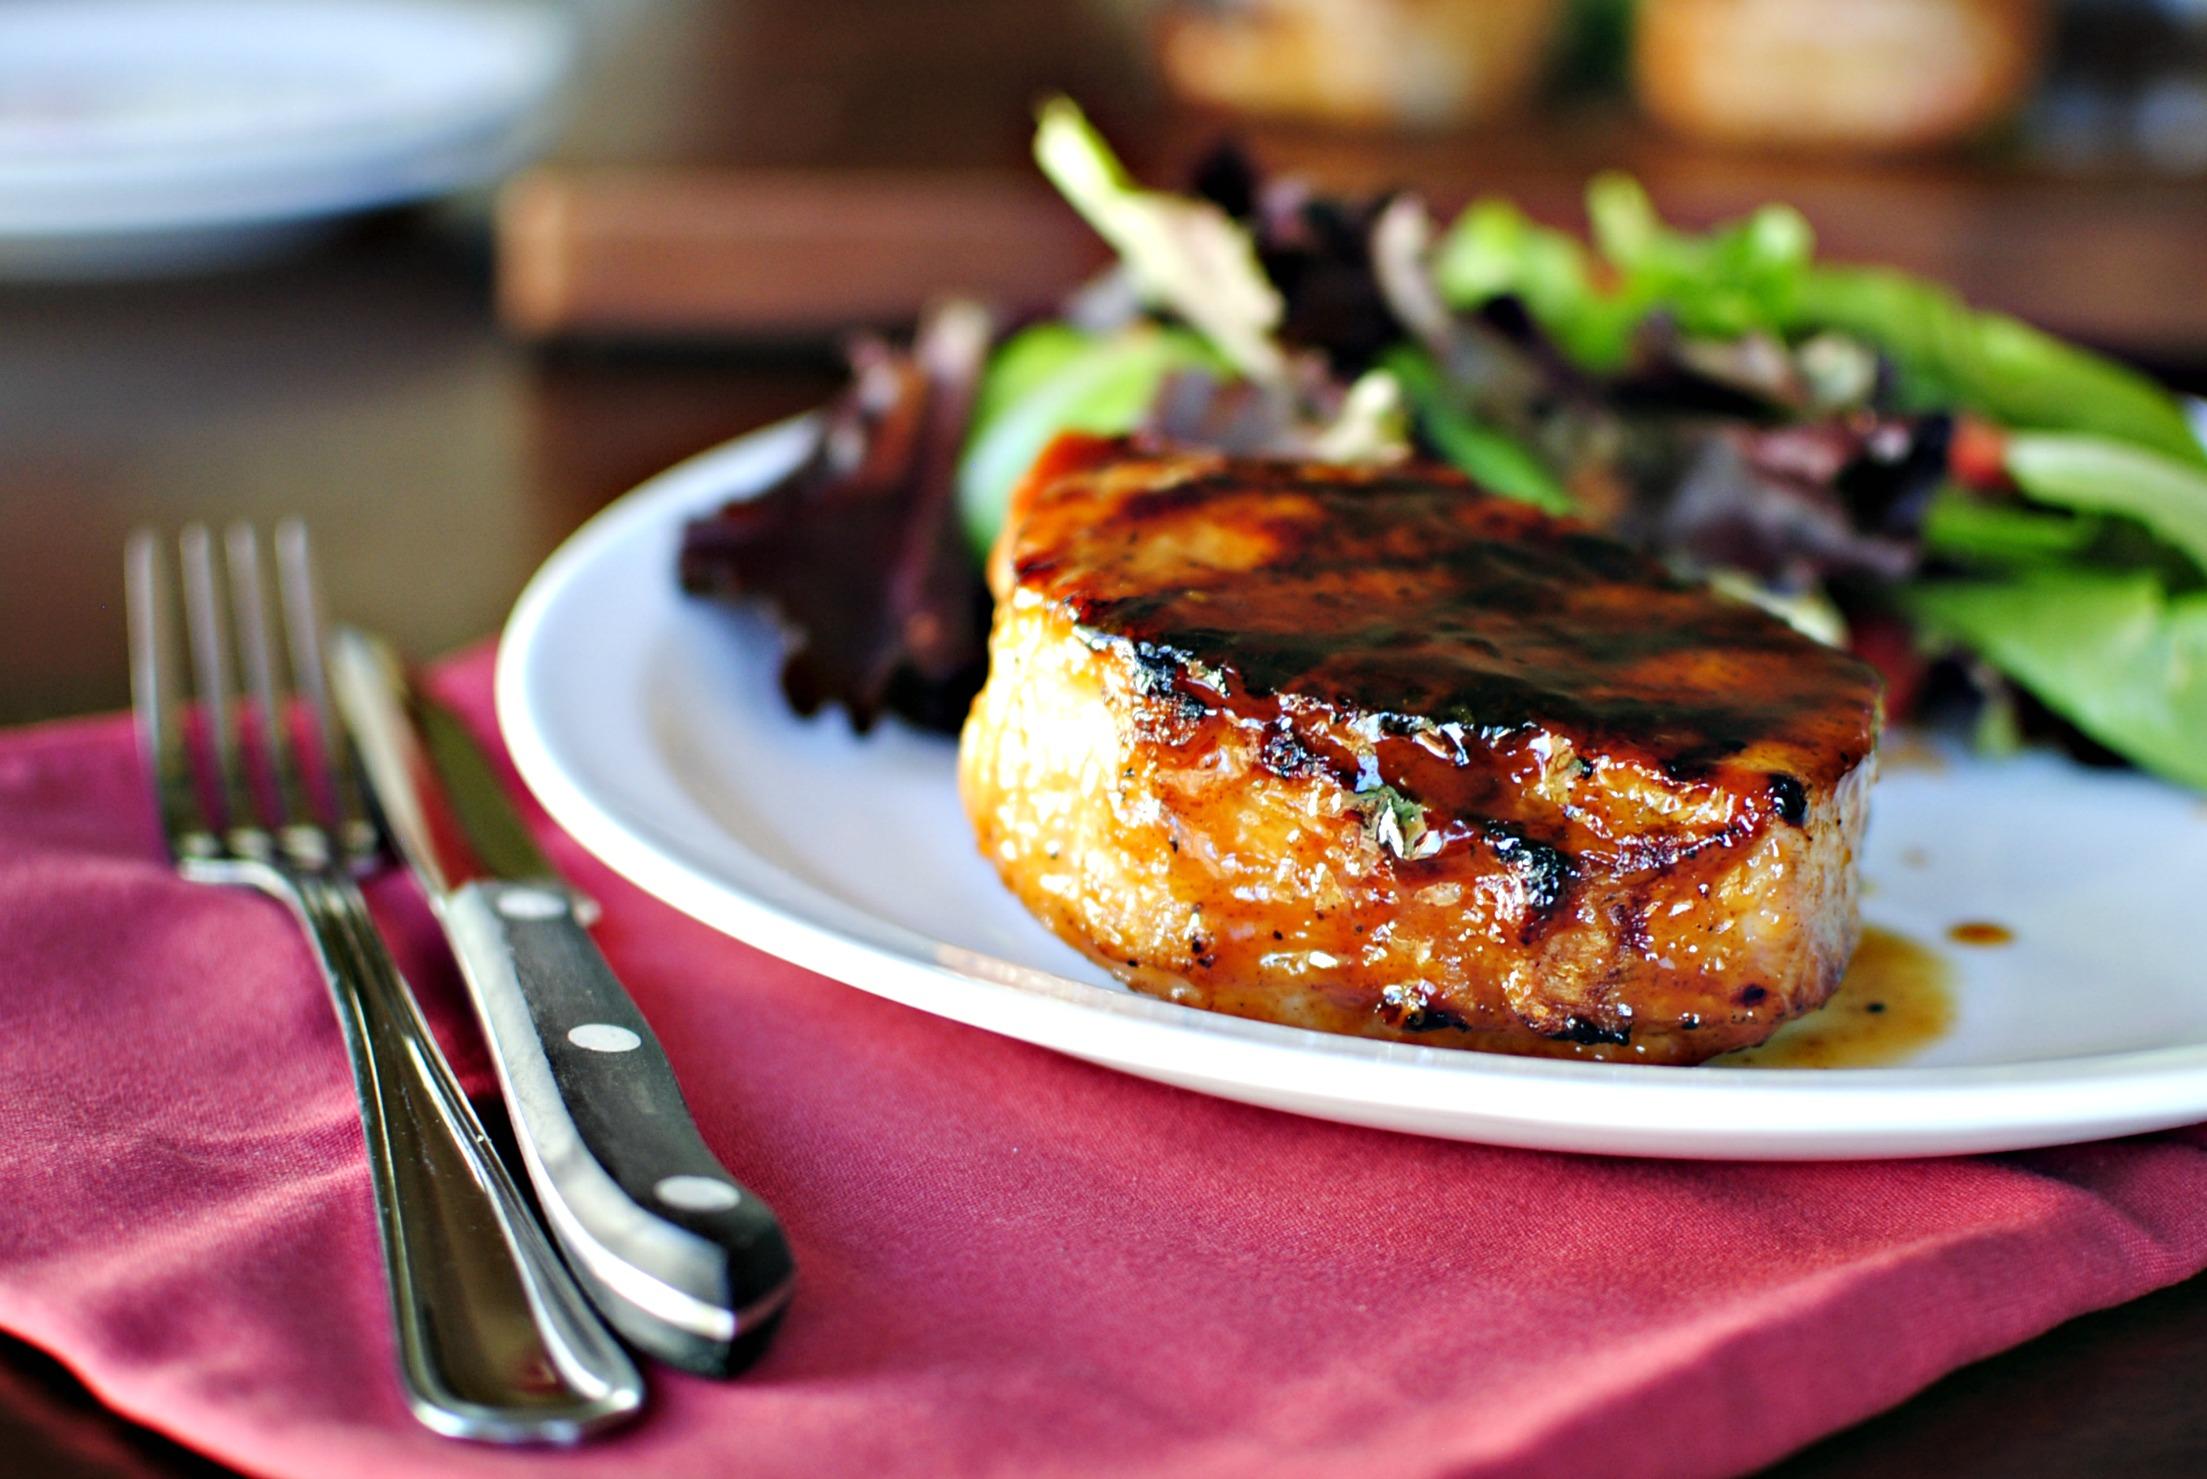 maple grilled pork chop recipe Grilled Maple Honey Glazed Pork Chops - Simply Scratch